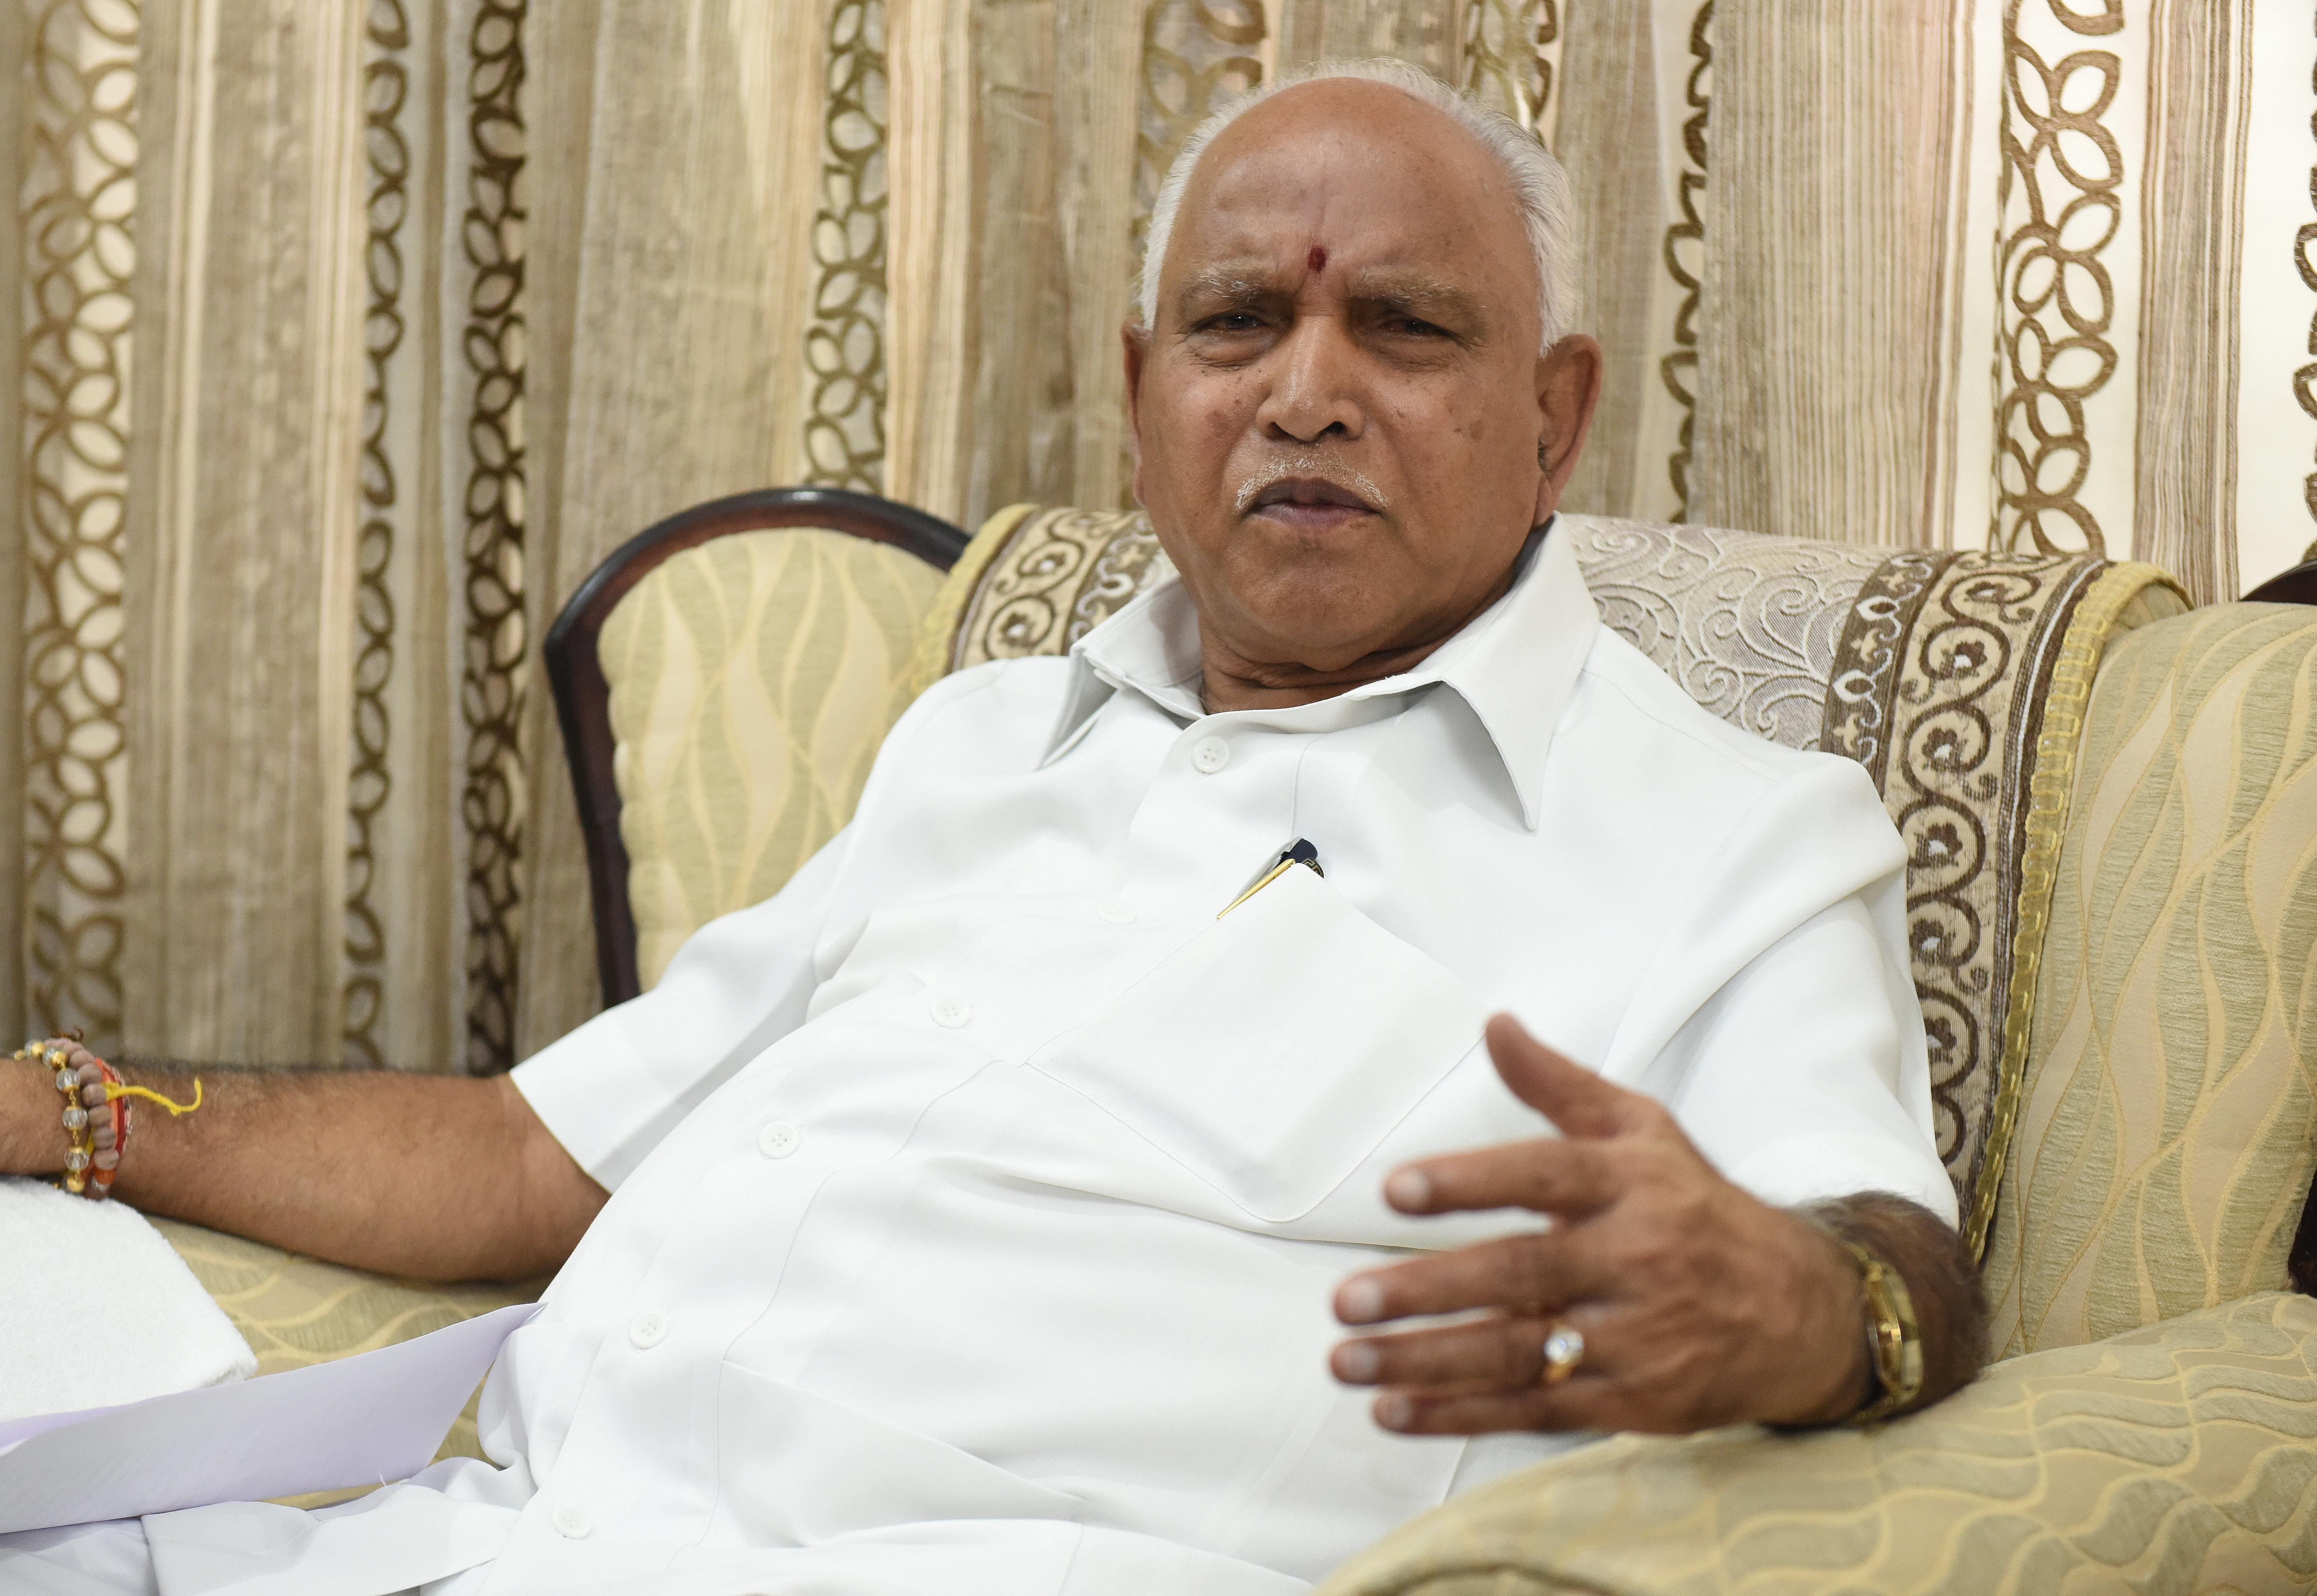 Did Yeddyurappa Pay Off BJP Leaders? Congress Demands